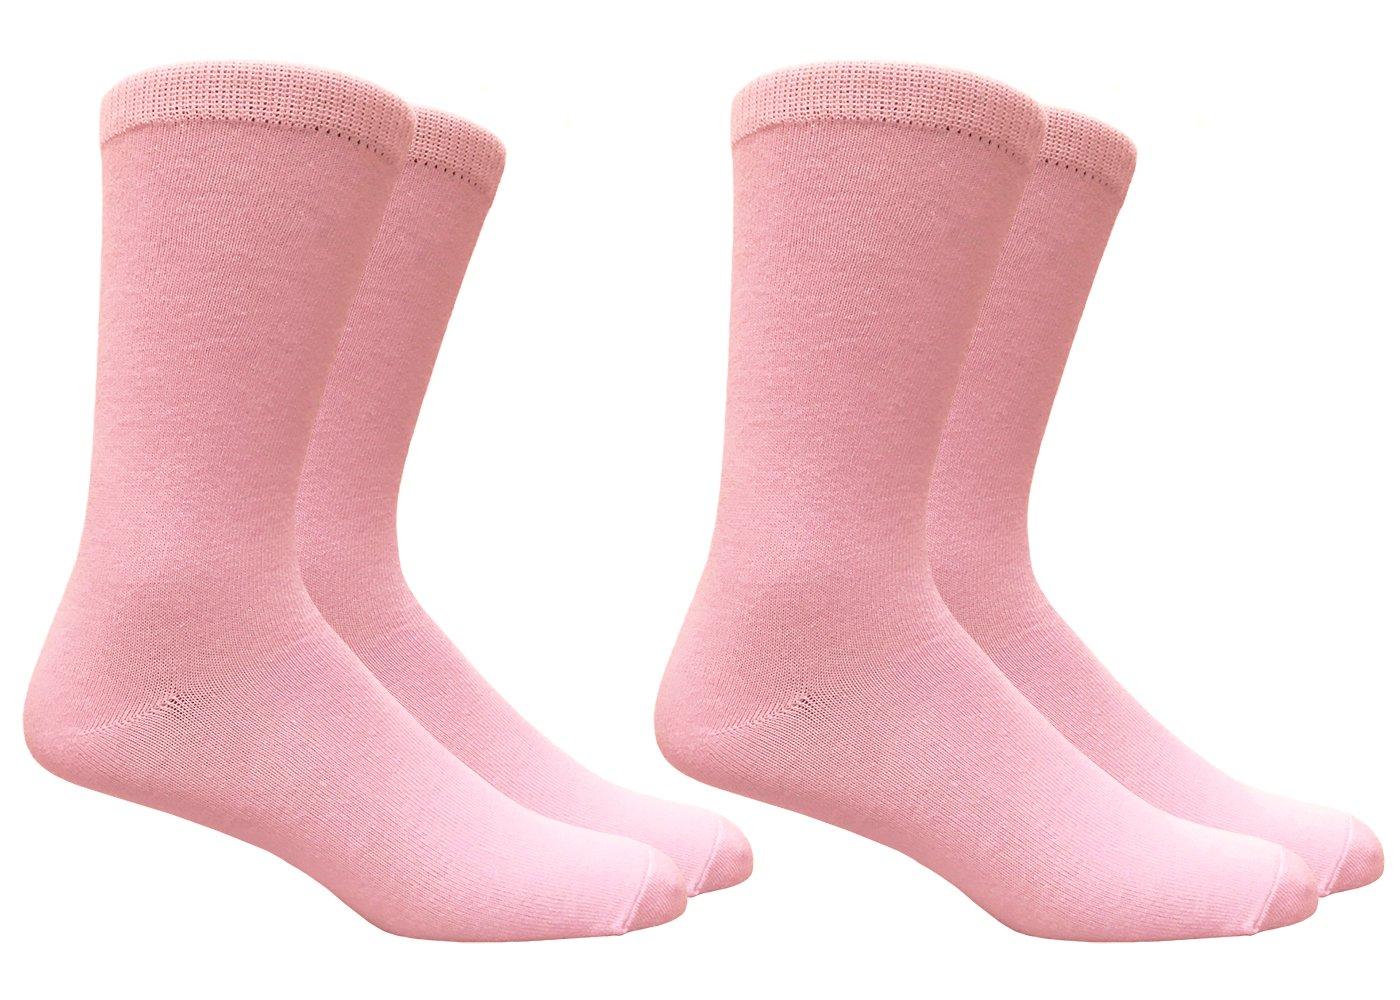 Men's Pink Trouser Dress Socks - 2 Pairs